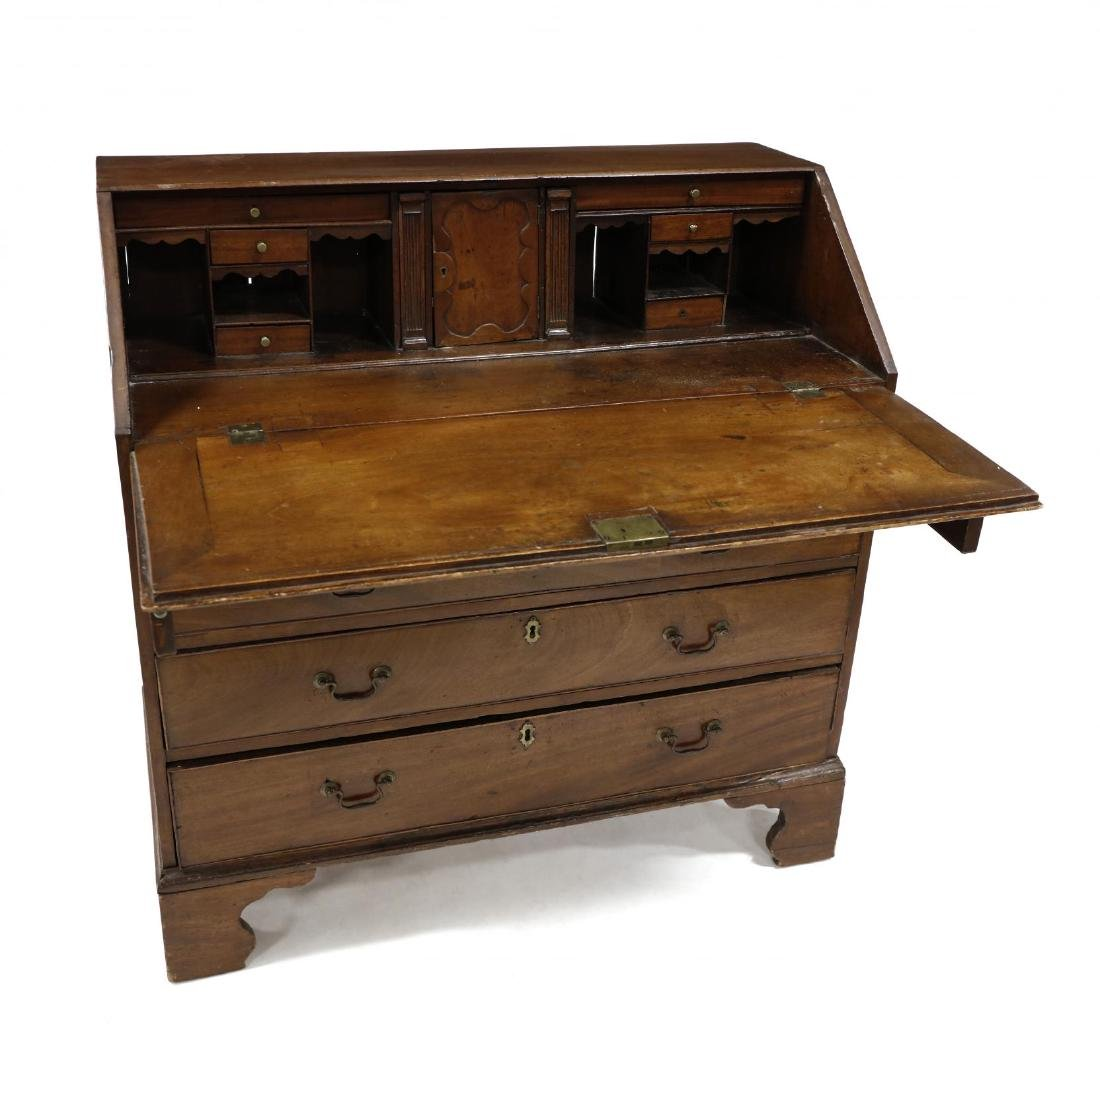 George II Mahogany Slant Front Desk - 3